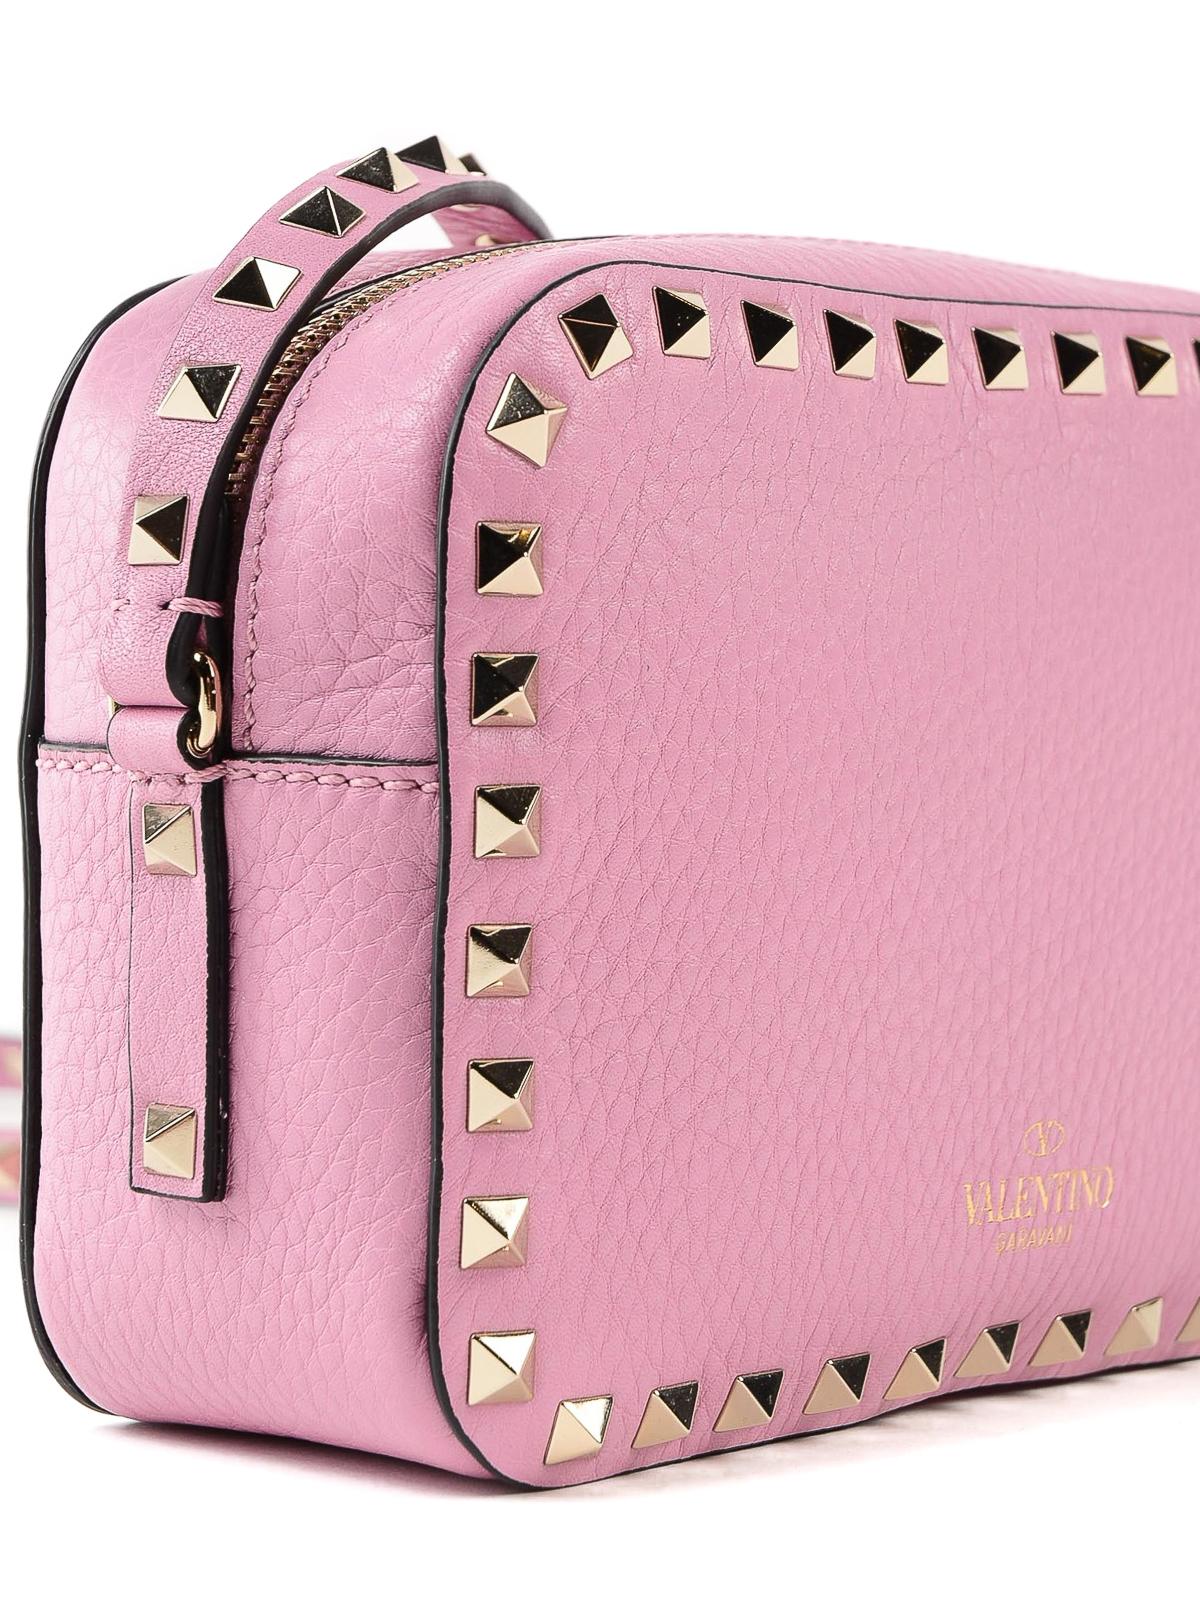 c9facbfc69 Valentino Garavani - Rockstud pink leather camera bag - shoulder ...